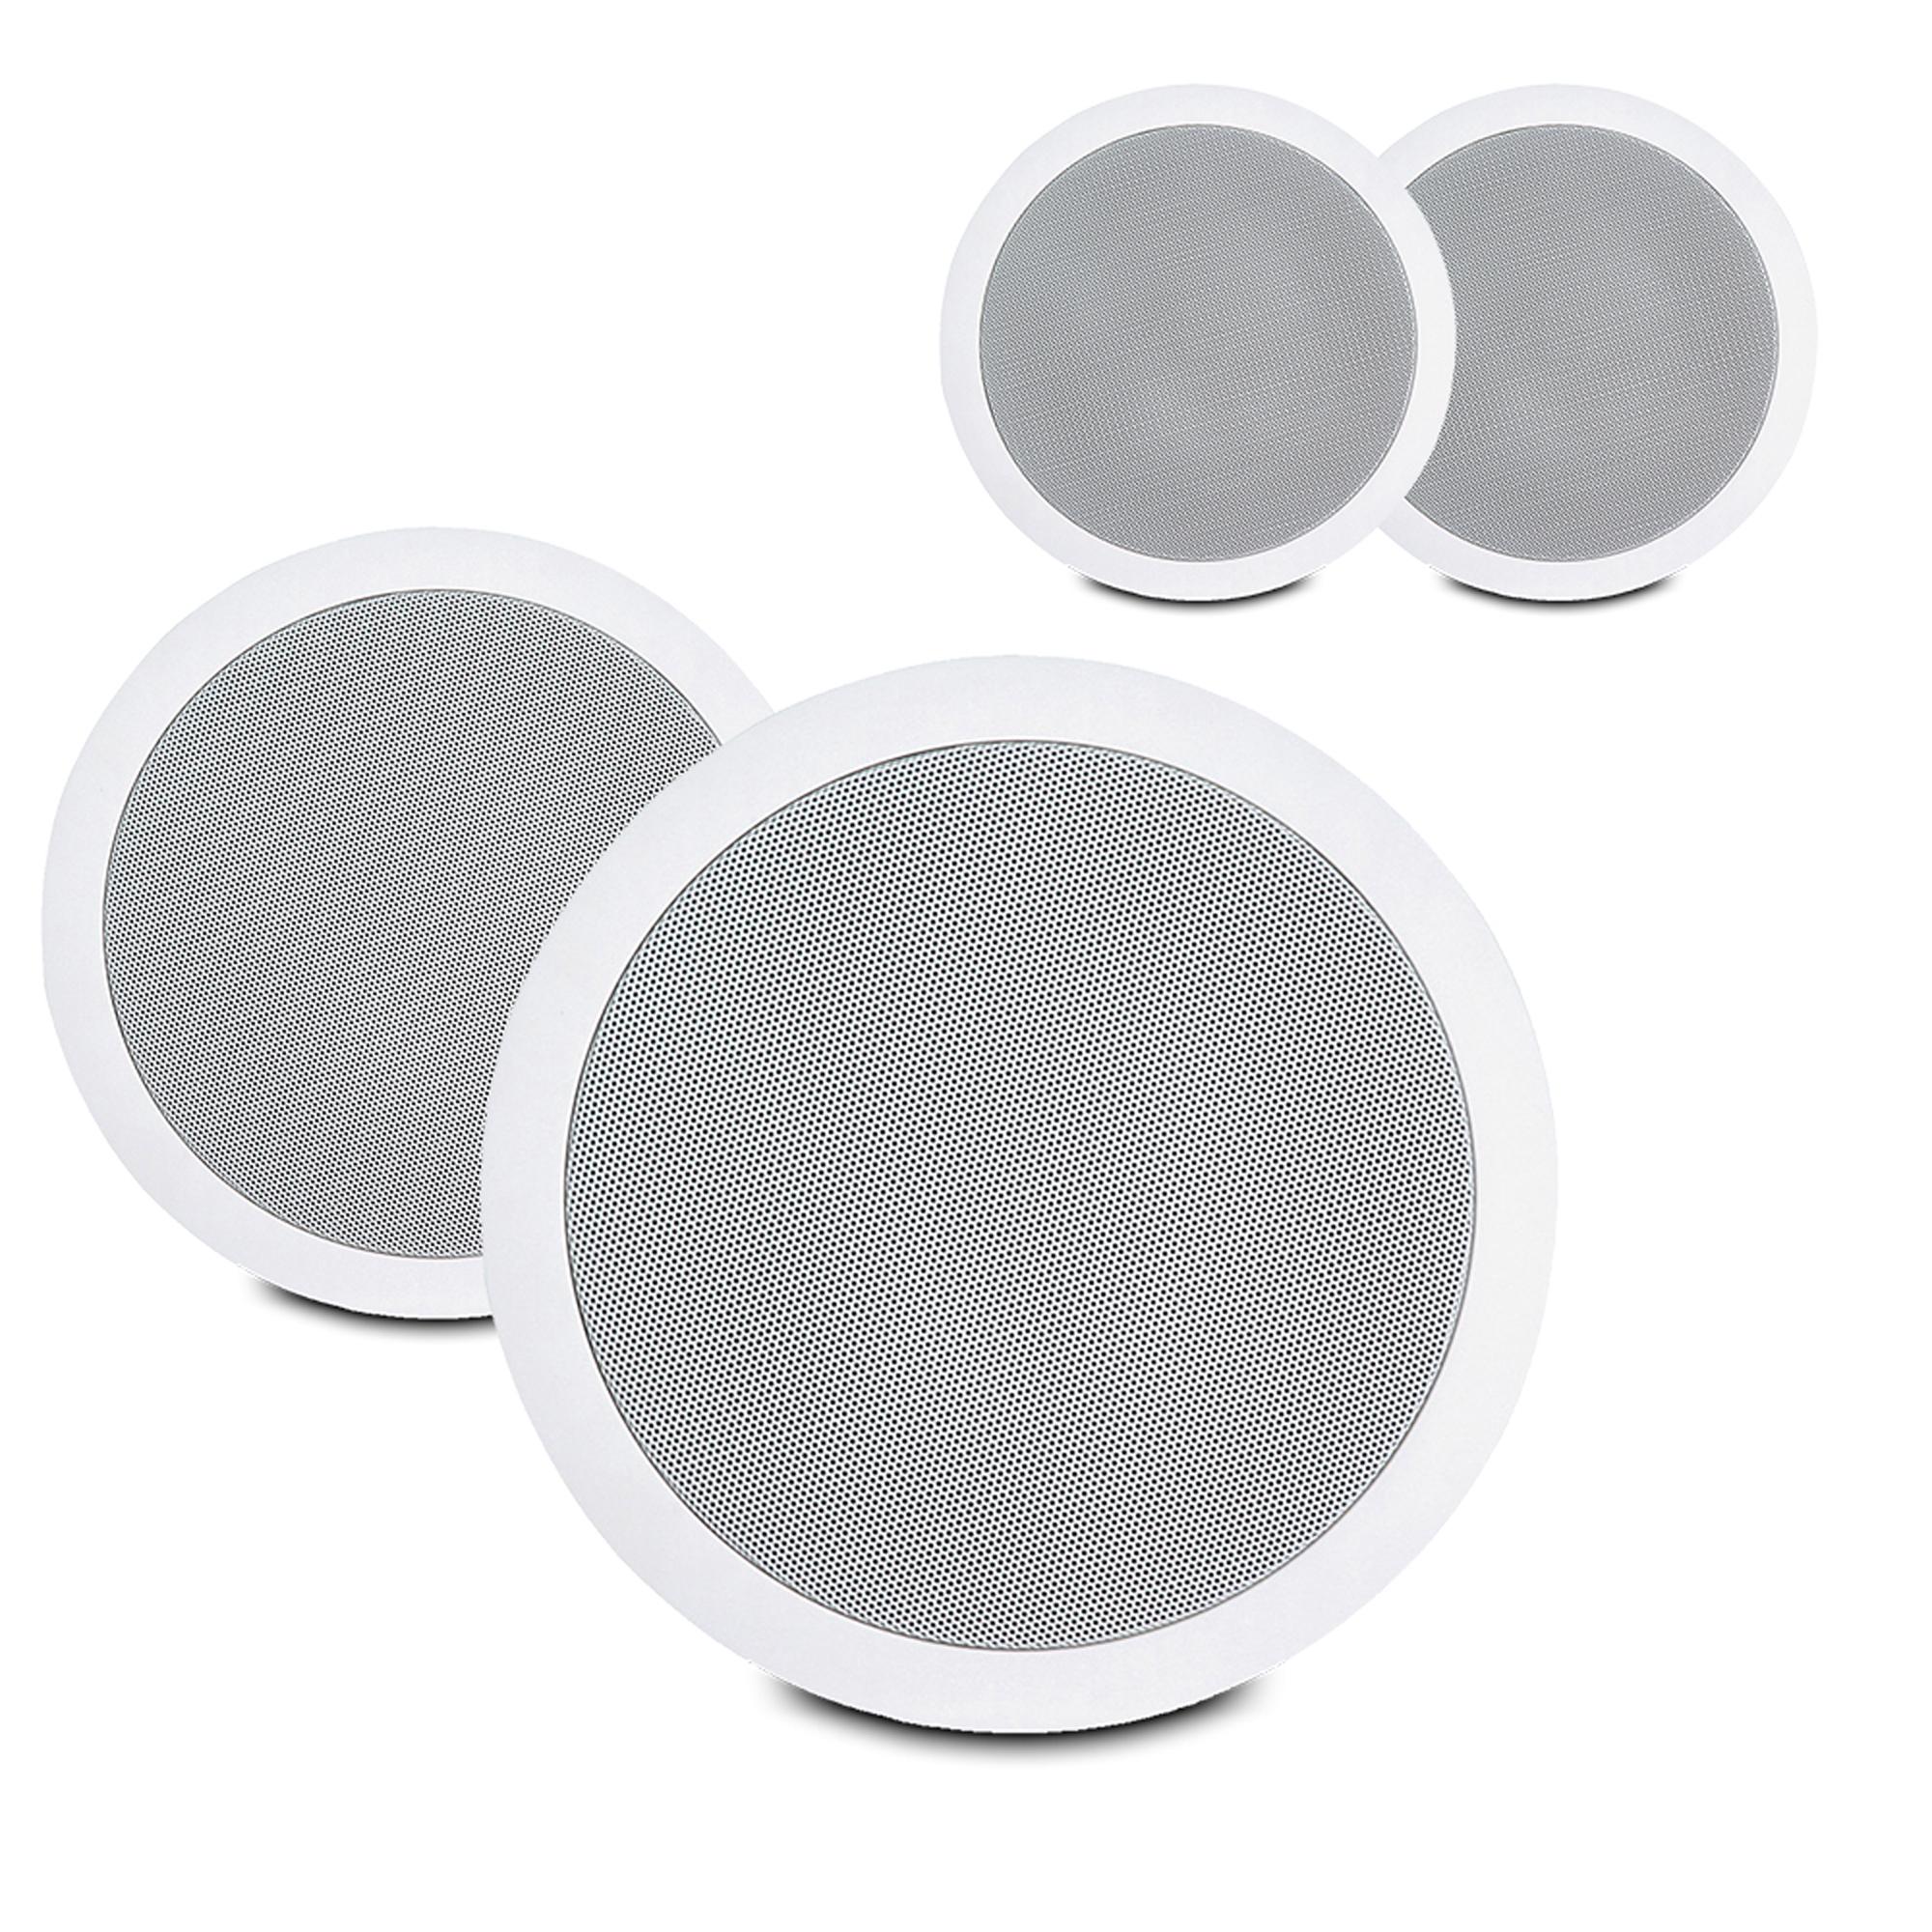 "PD CSPT6 6.5"" 100V Ceiling Speakers, Set of 4"